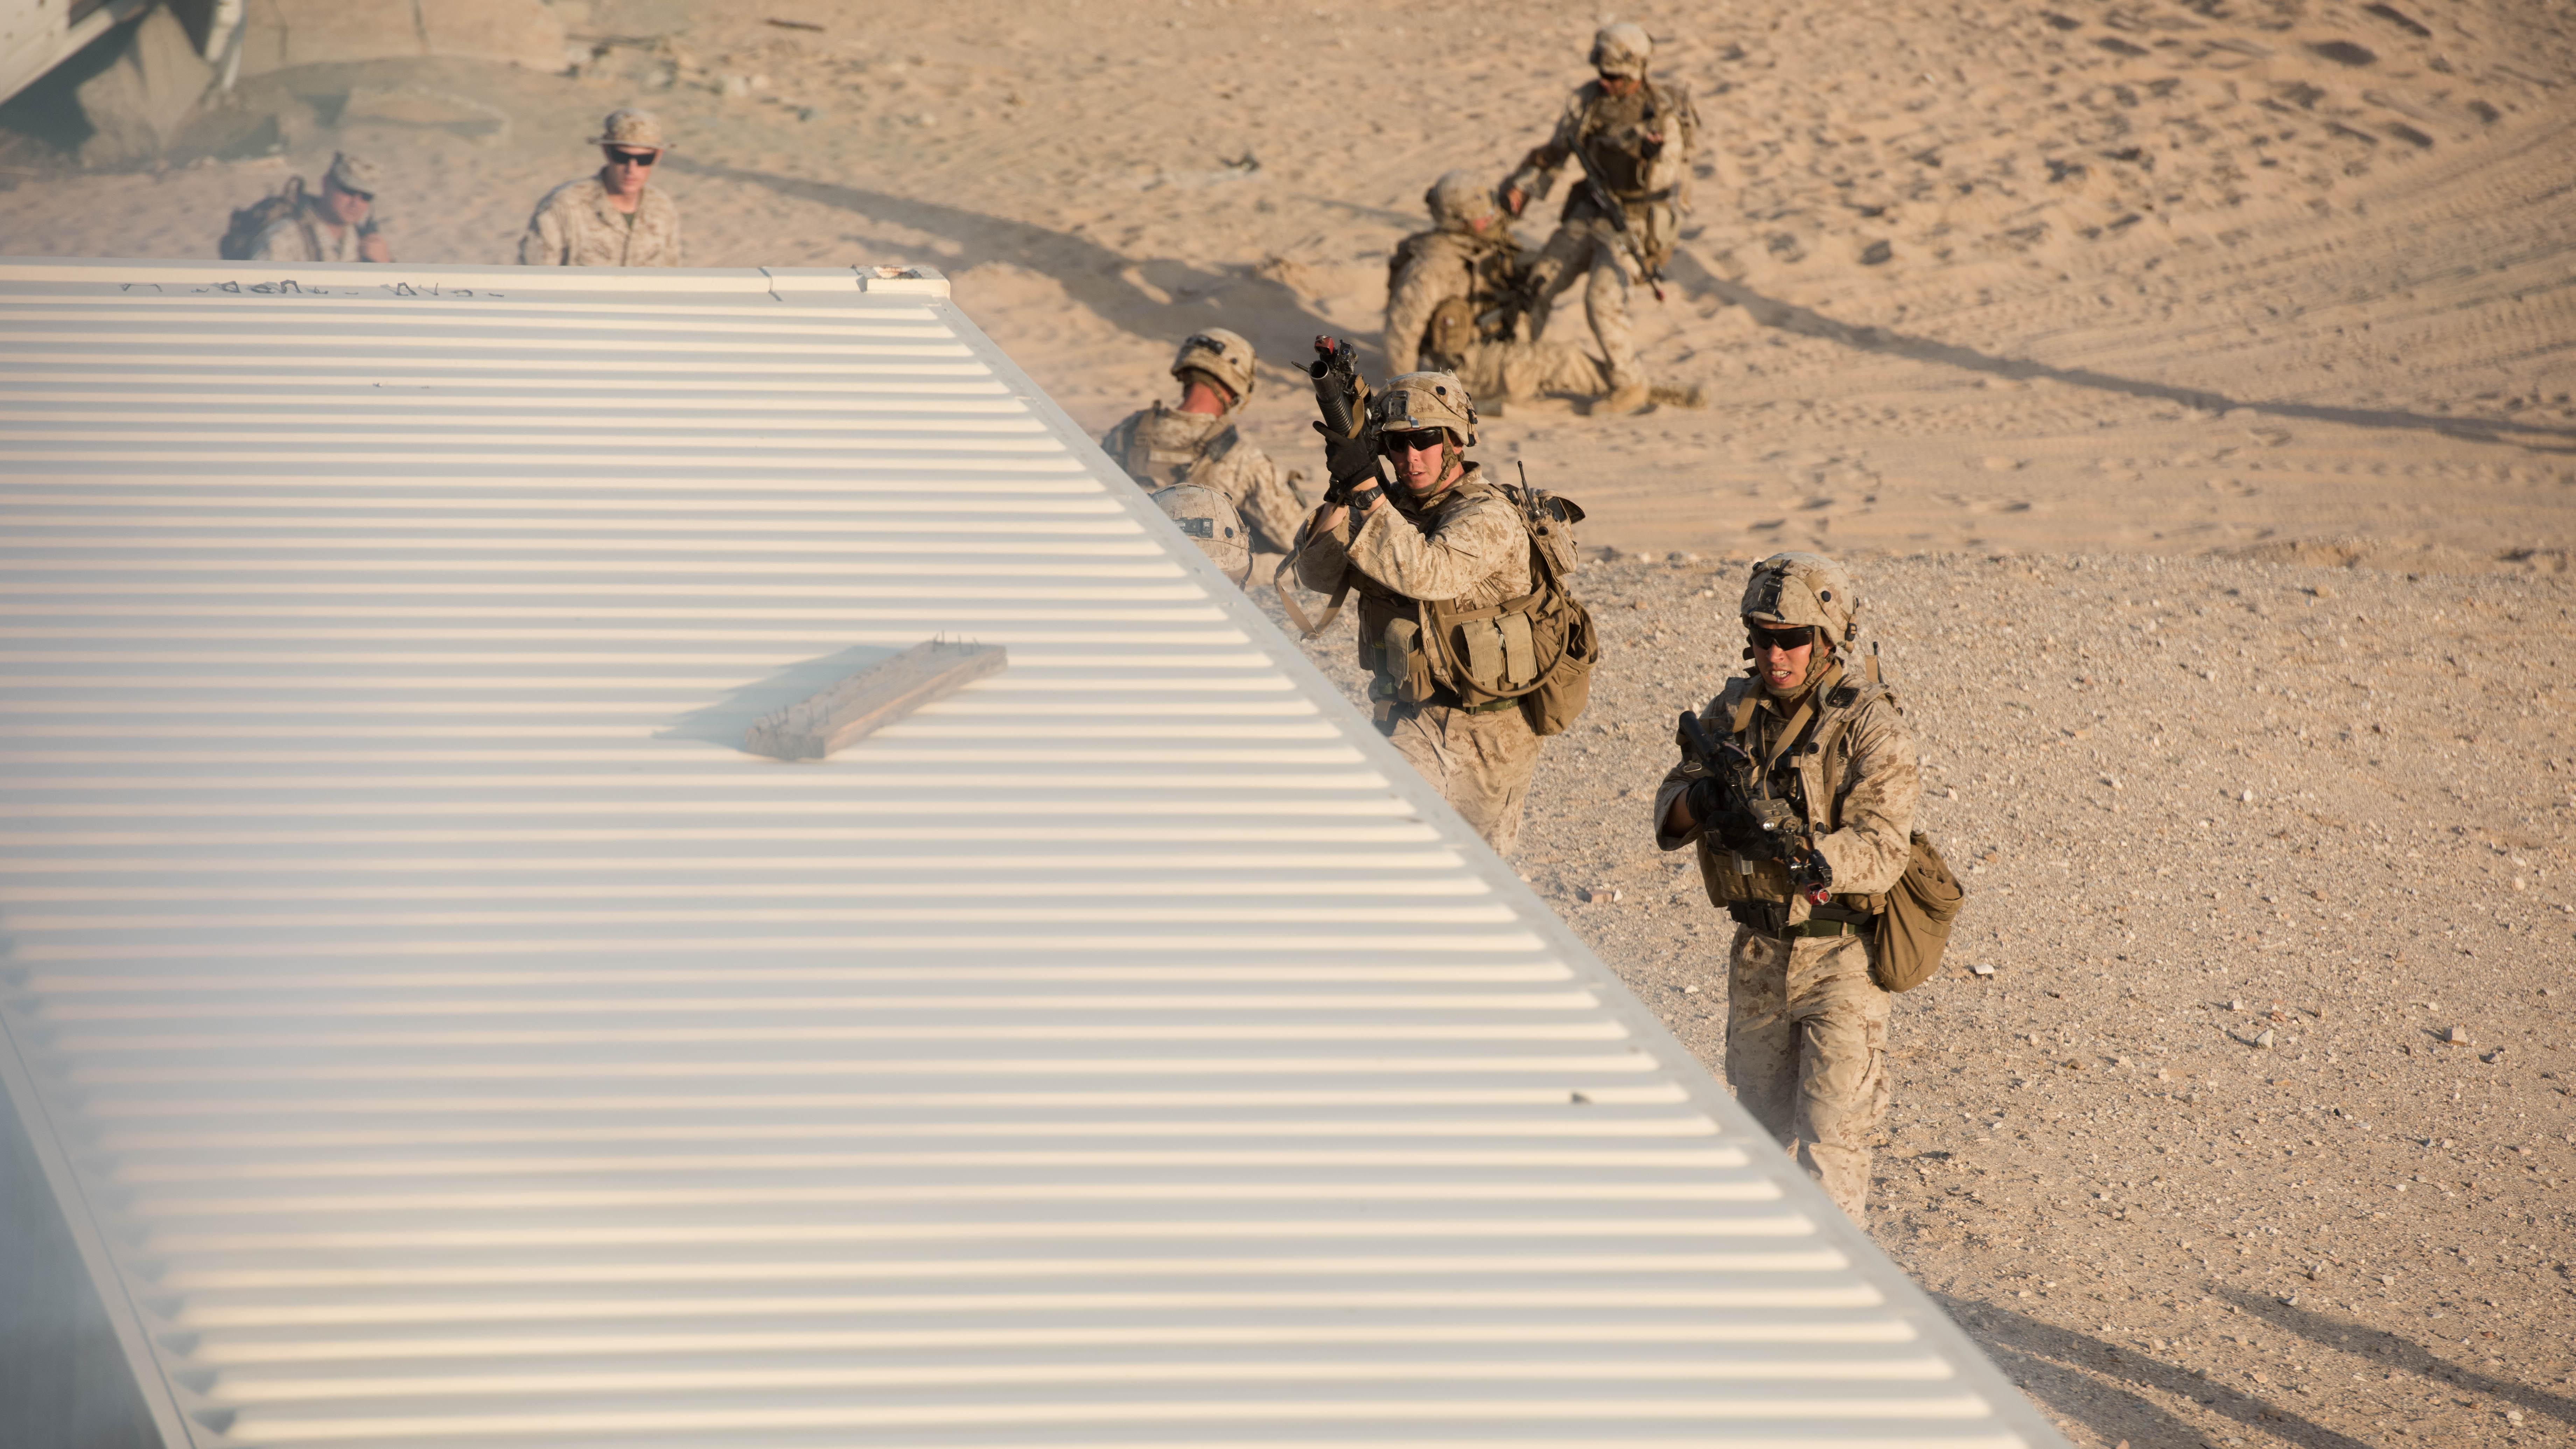 Darkhorse Marines Assault California During Magtf Integrated